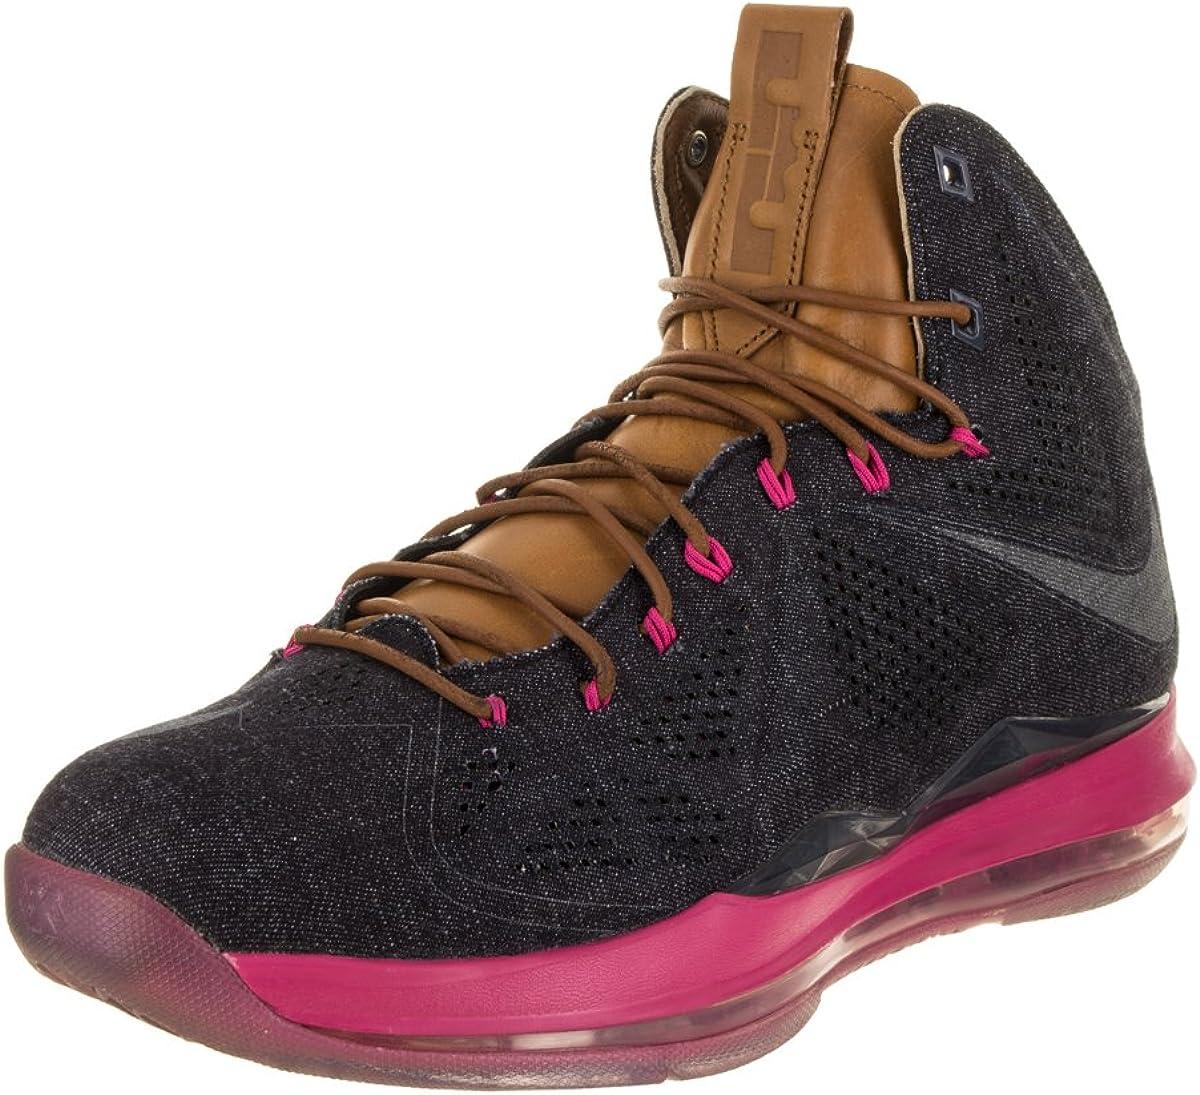 Lebron X EXT Denim QS Basketball Shoe